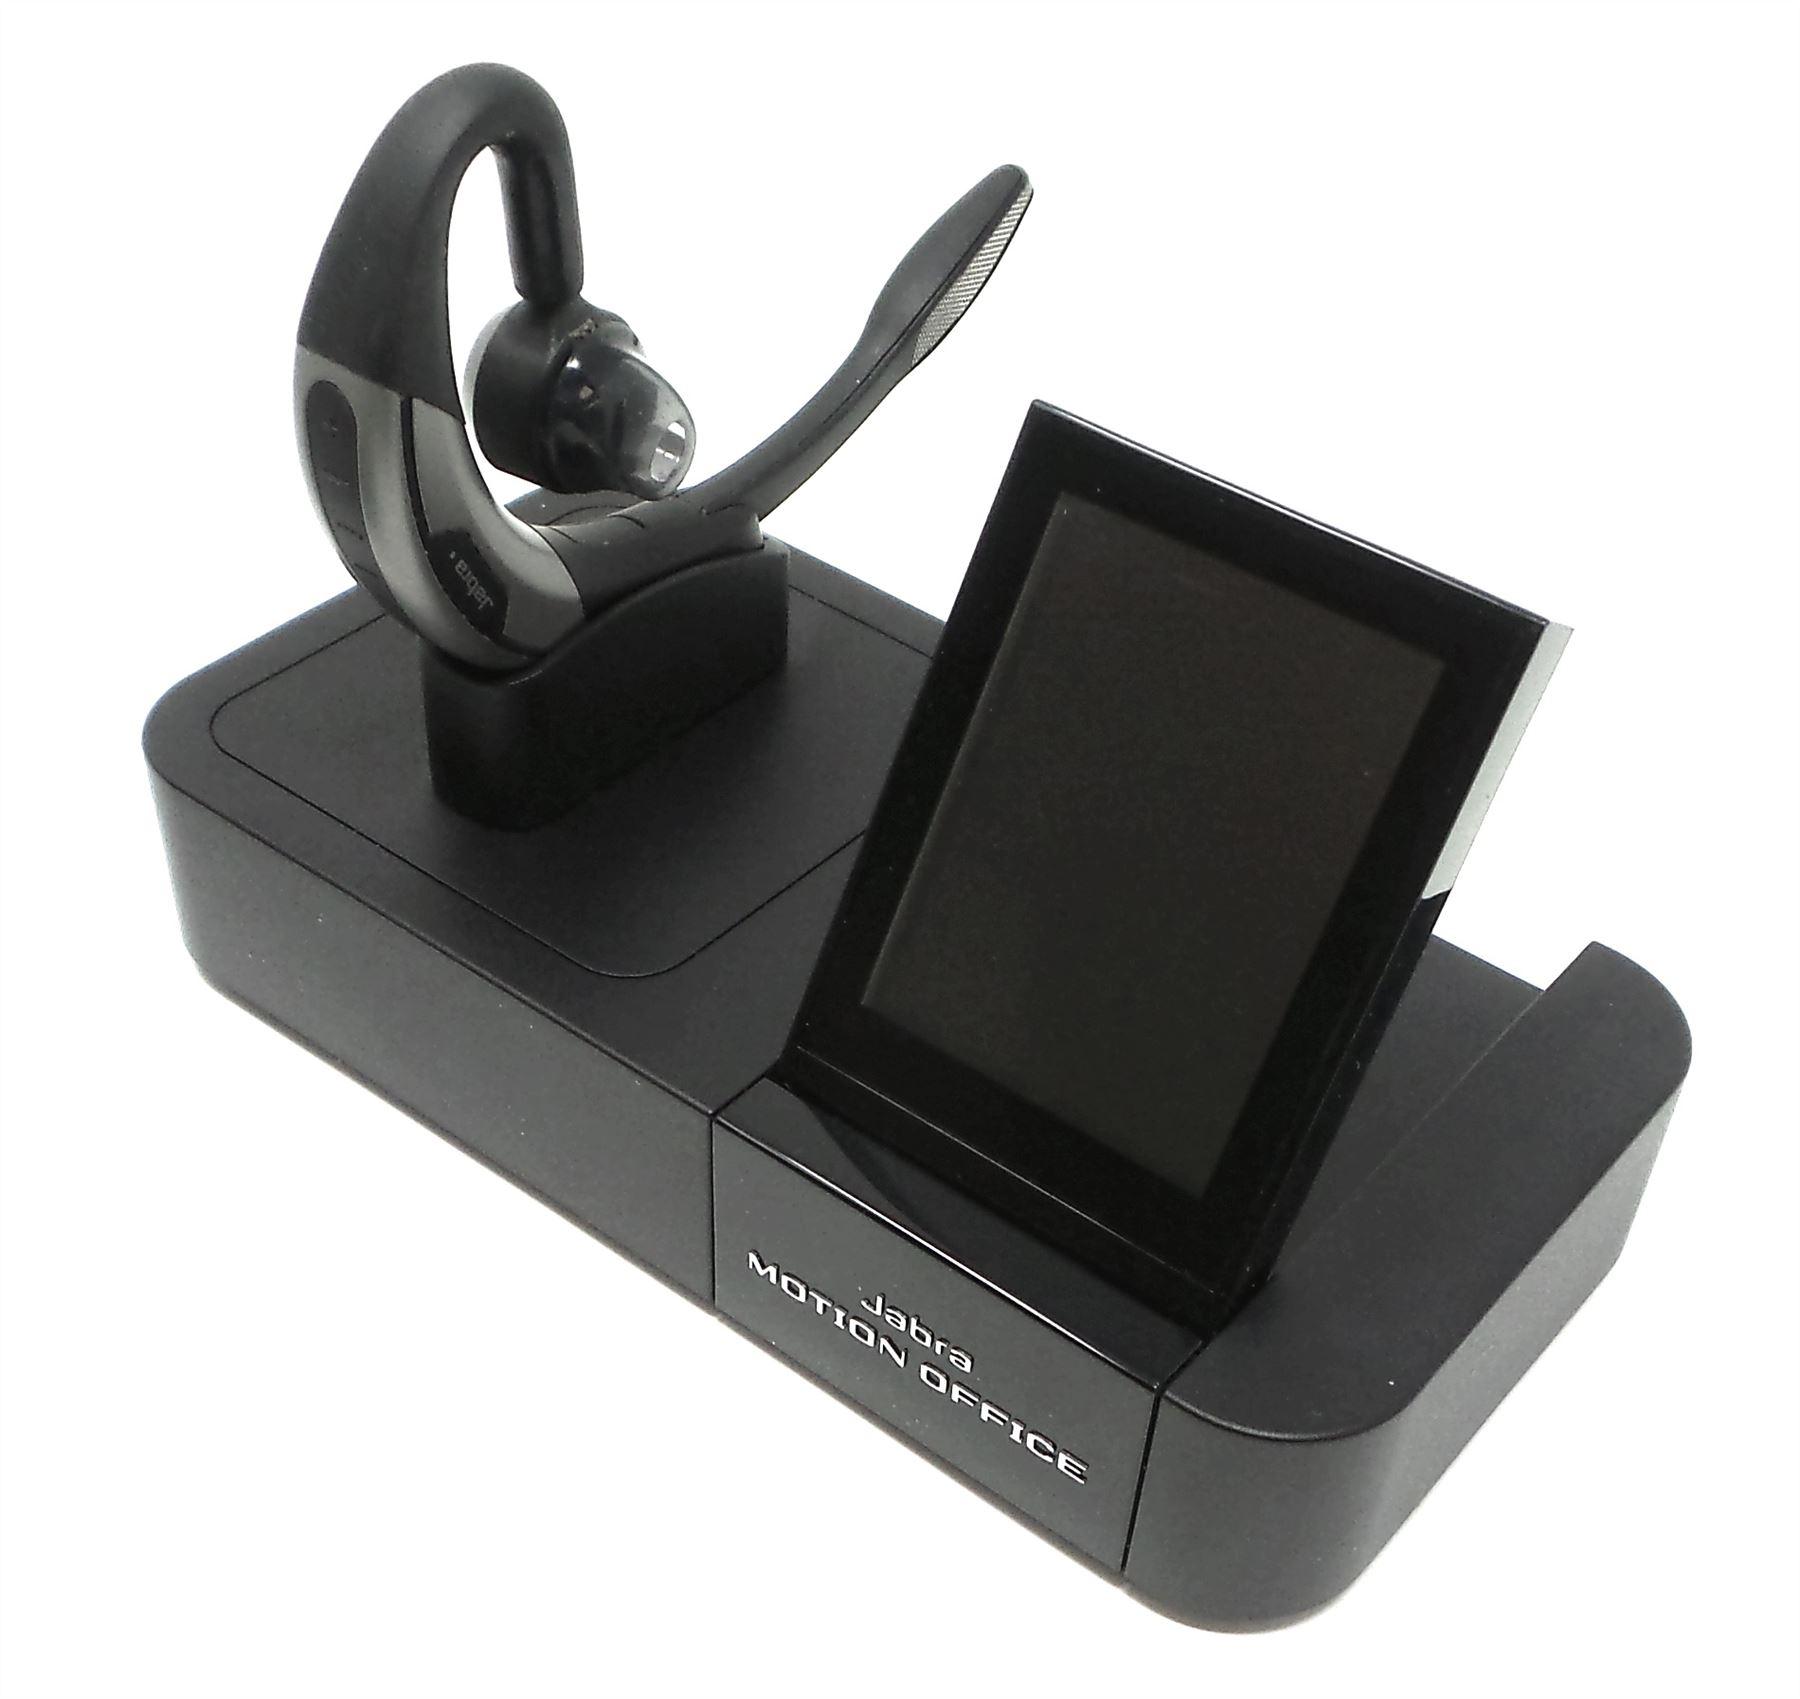 a848032b322 Jabra MOTION Office MS Lync Wireless BT Headset Charge+Travel Black 6670 -904-305